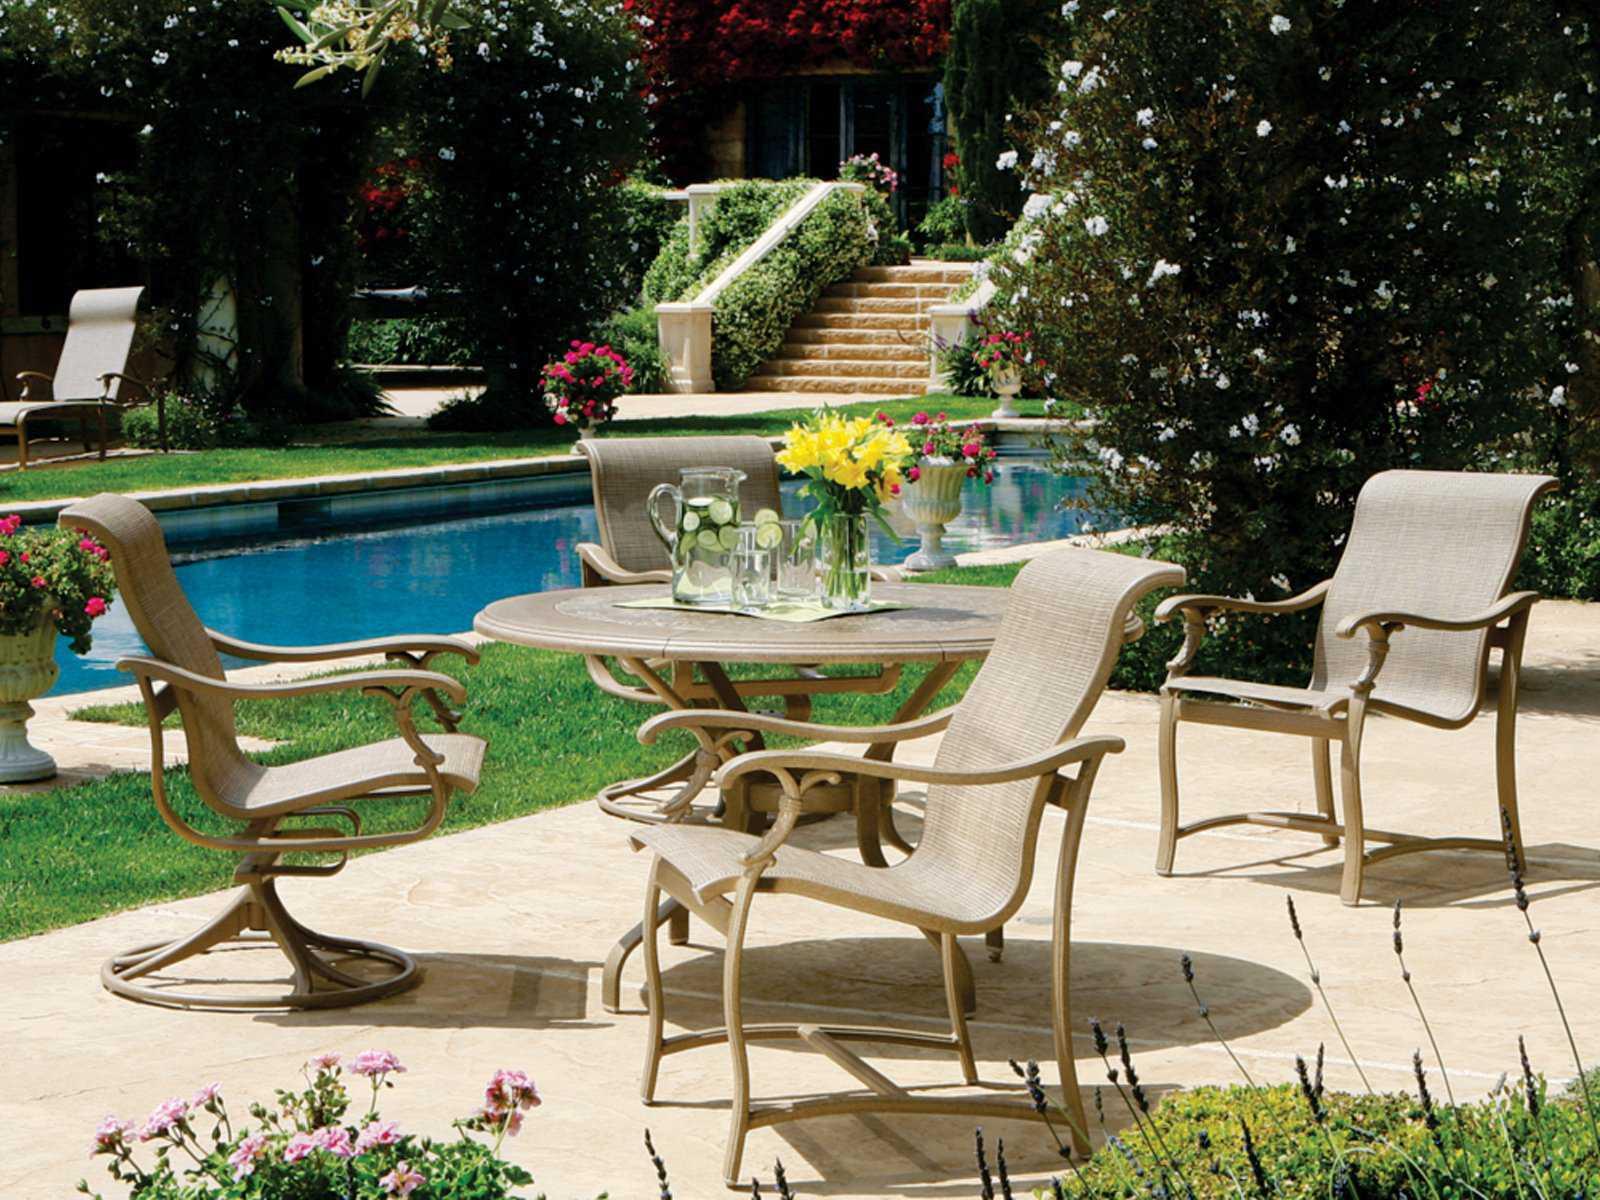 Tropitone Ravello Sling Aluminum Dining Set RVSDS - Tropitone outdoor furniture